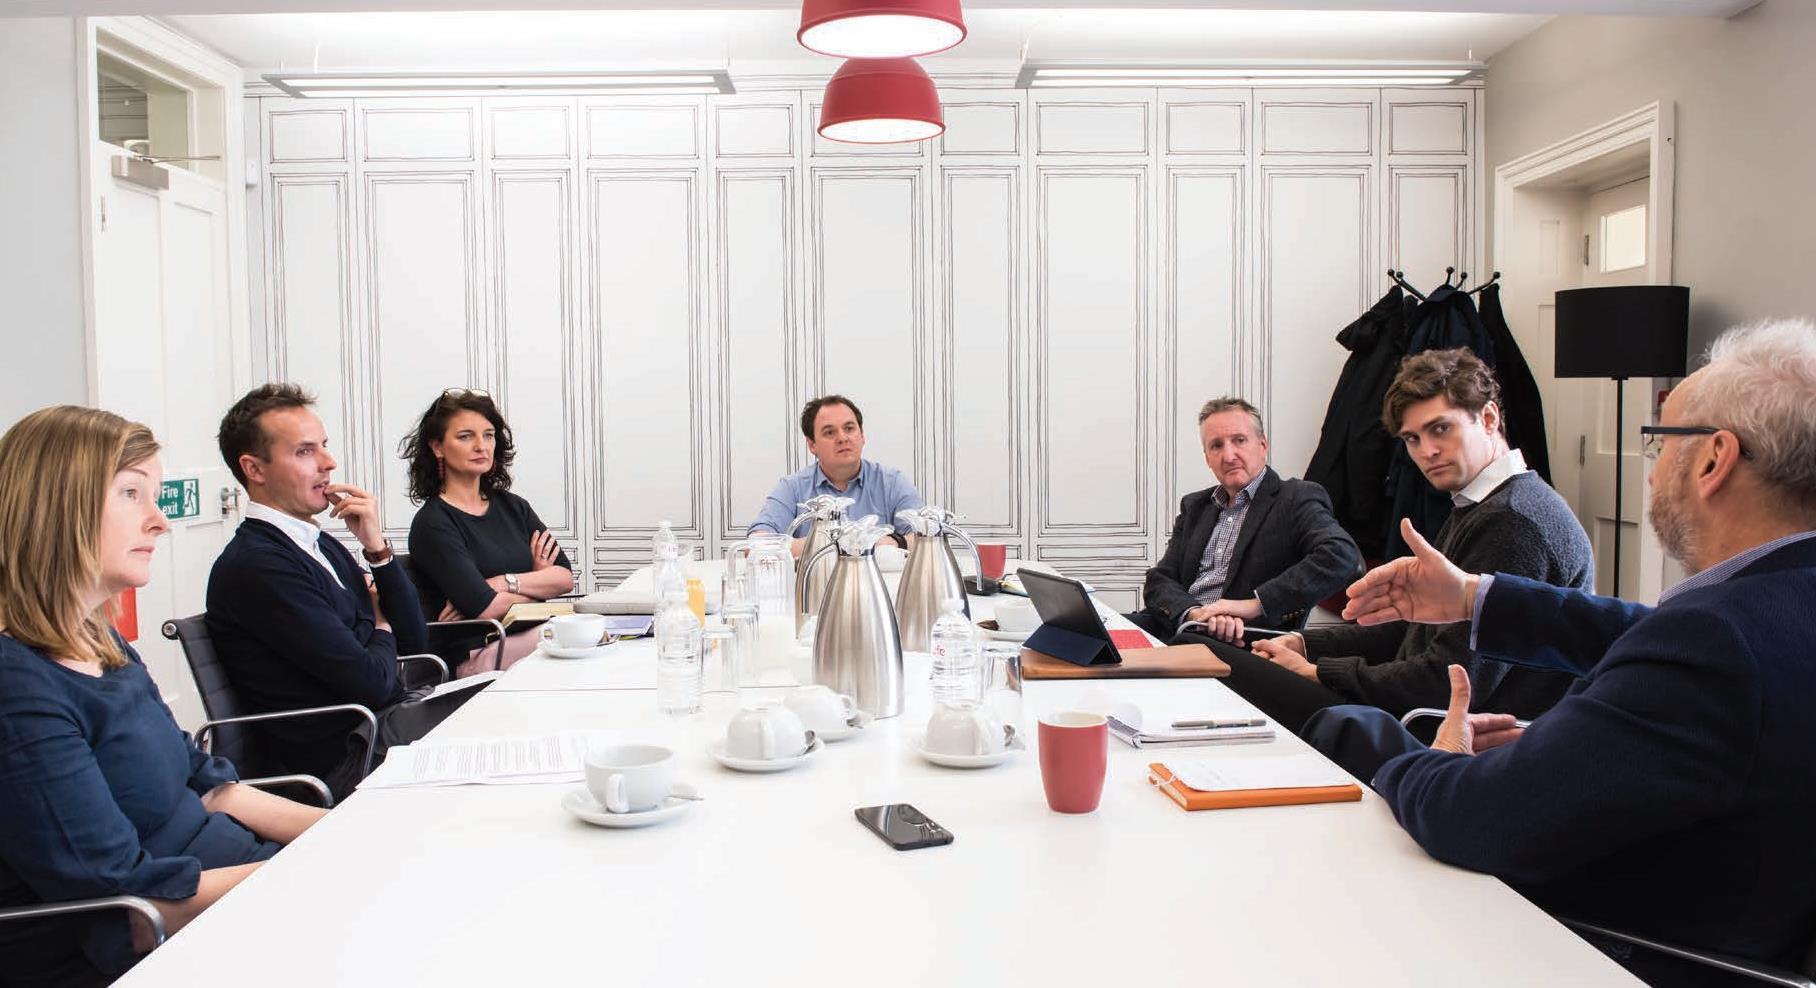 Yardi think tank: why flexibility is the future   Insight